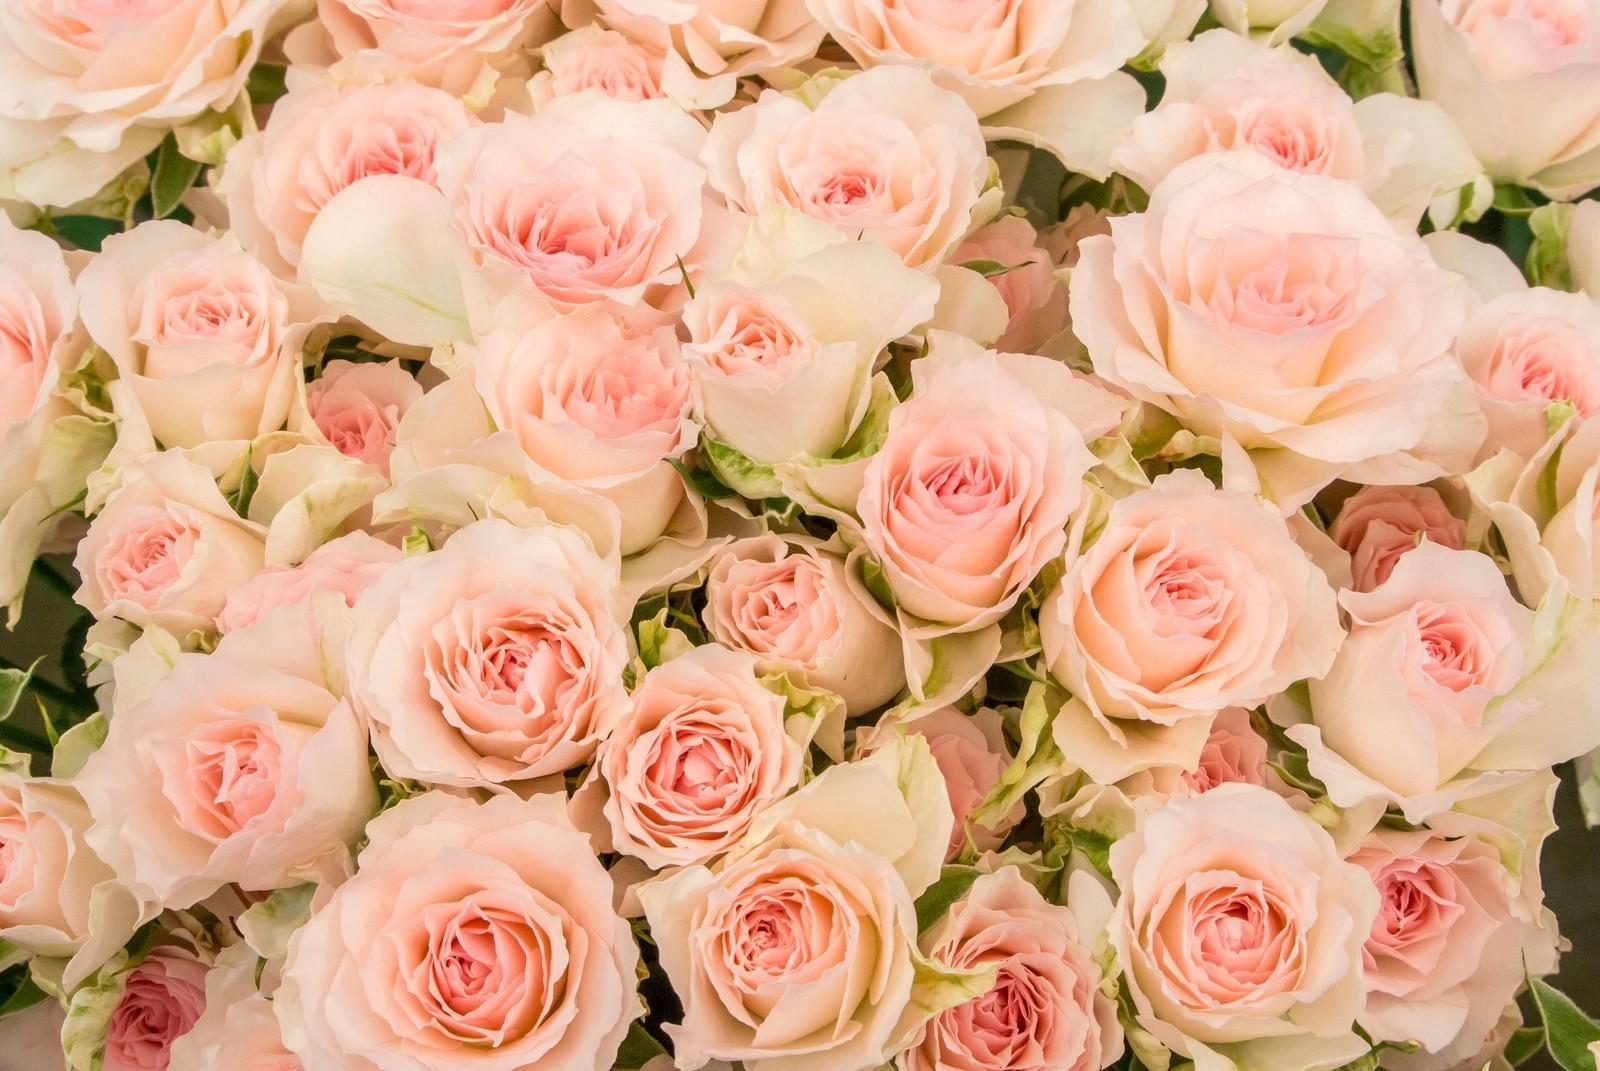 rose薄い ピンク